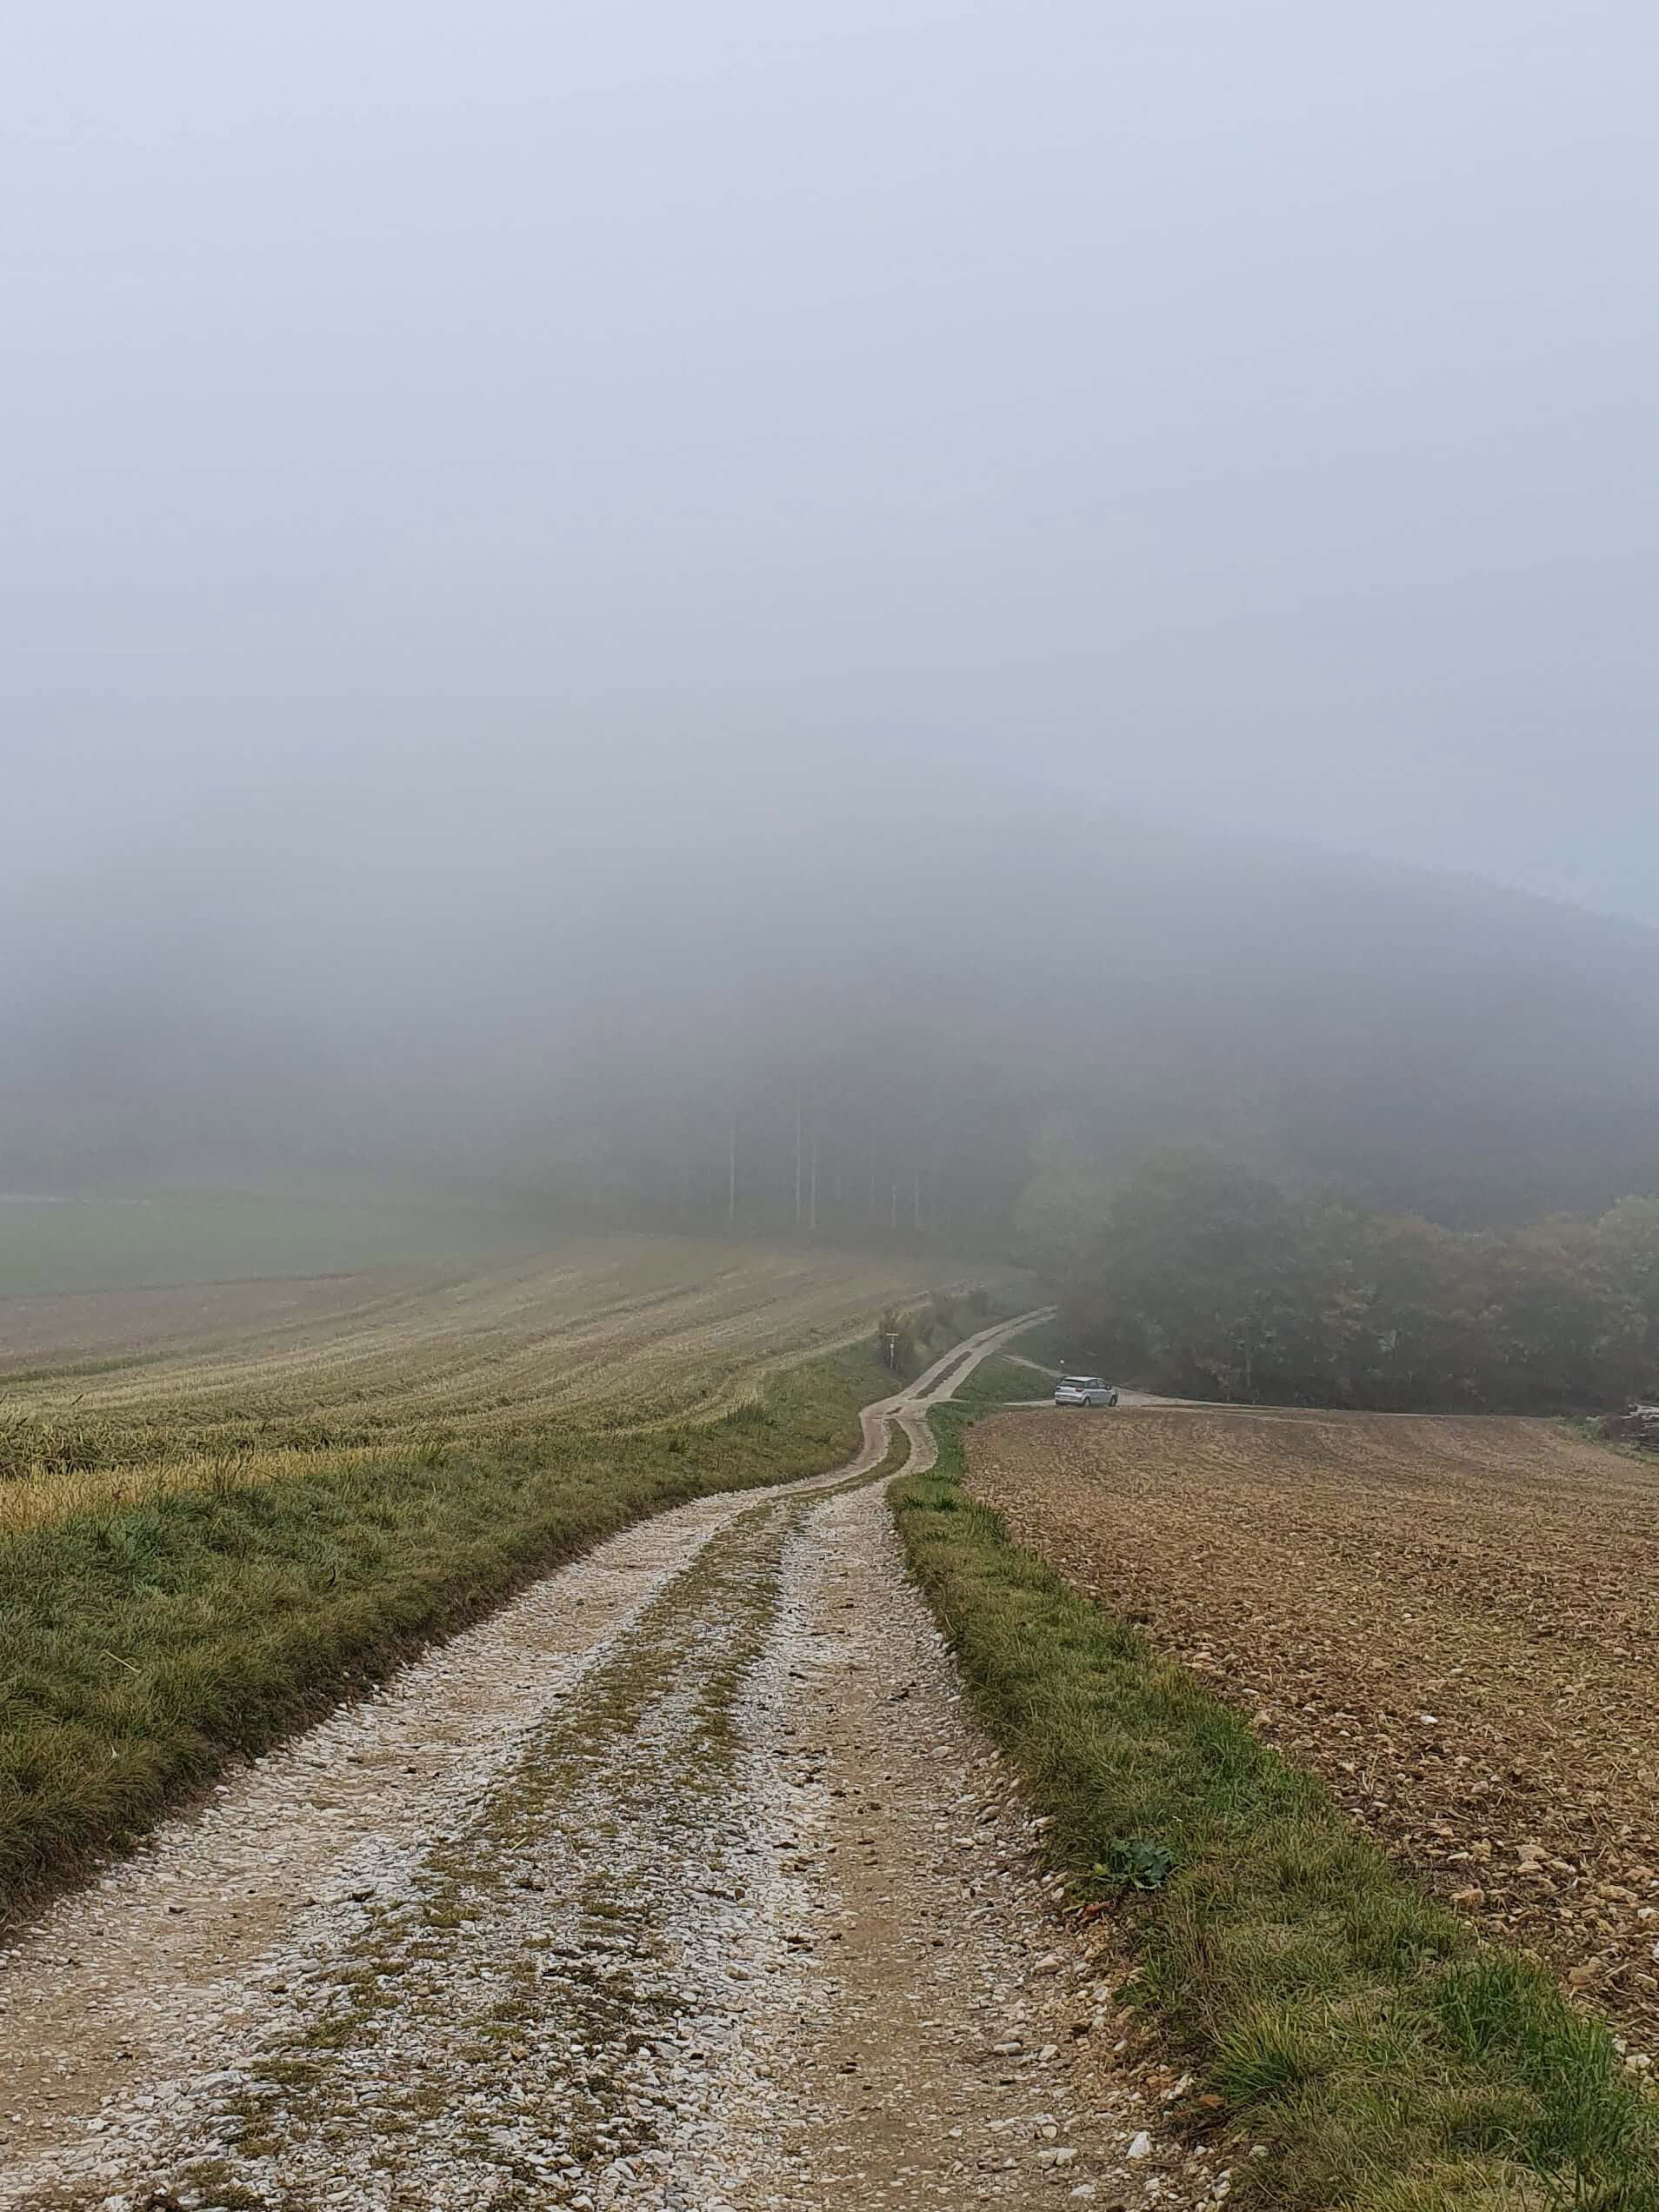 Fabulousky Studio Photography About Me_Fog_Austria